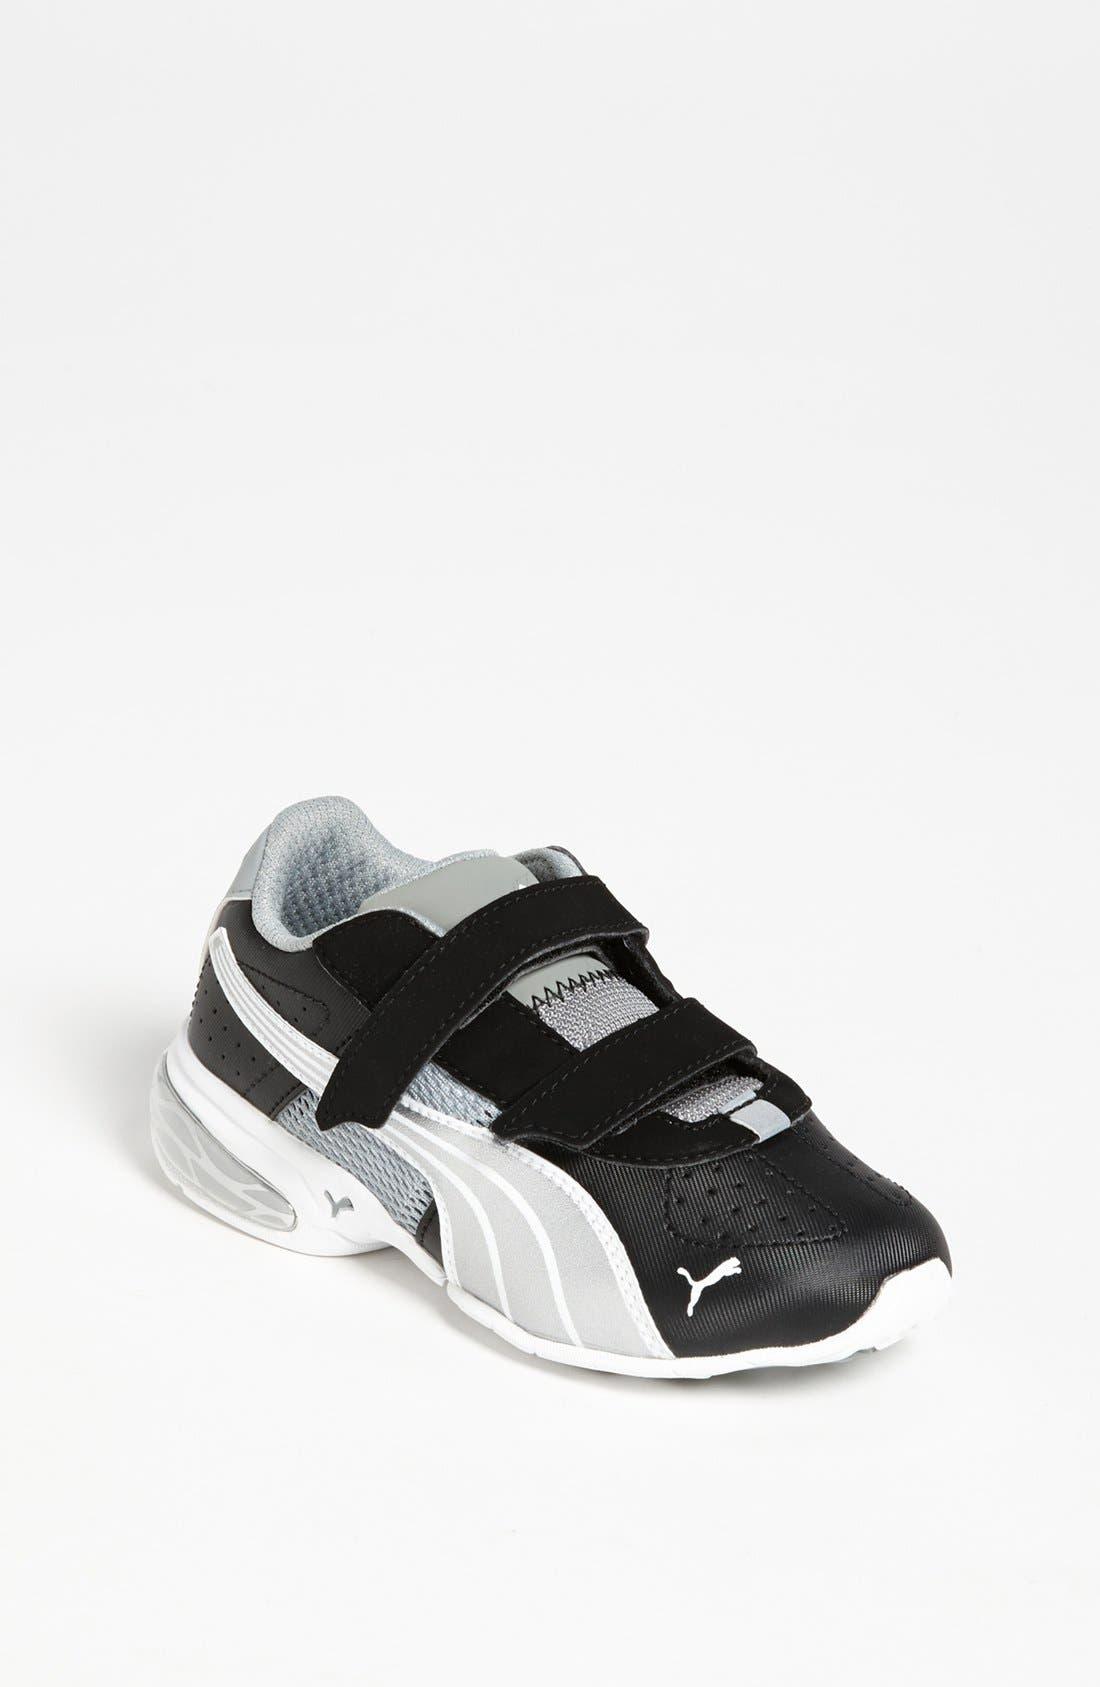 Main Image - PUMA 'Cell Surin V' Sneaker (Baby, Walker, Toddler & Little Kid)